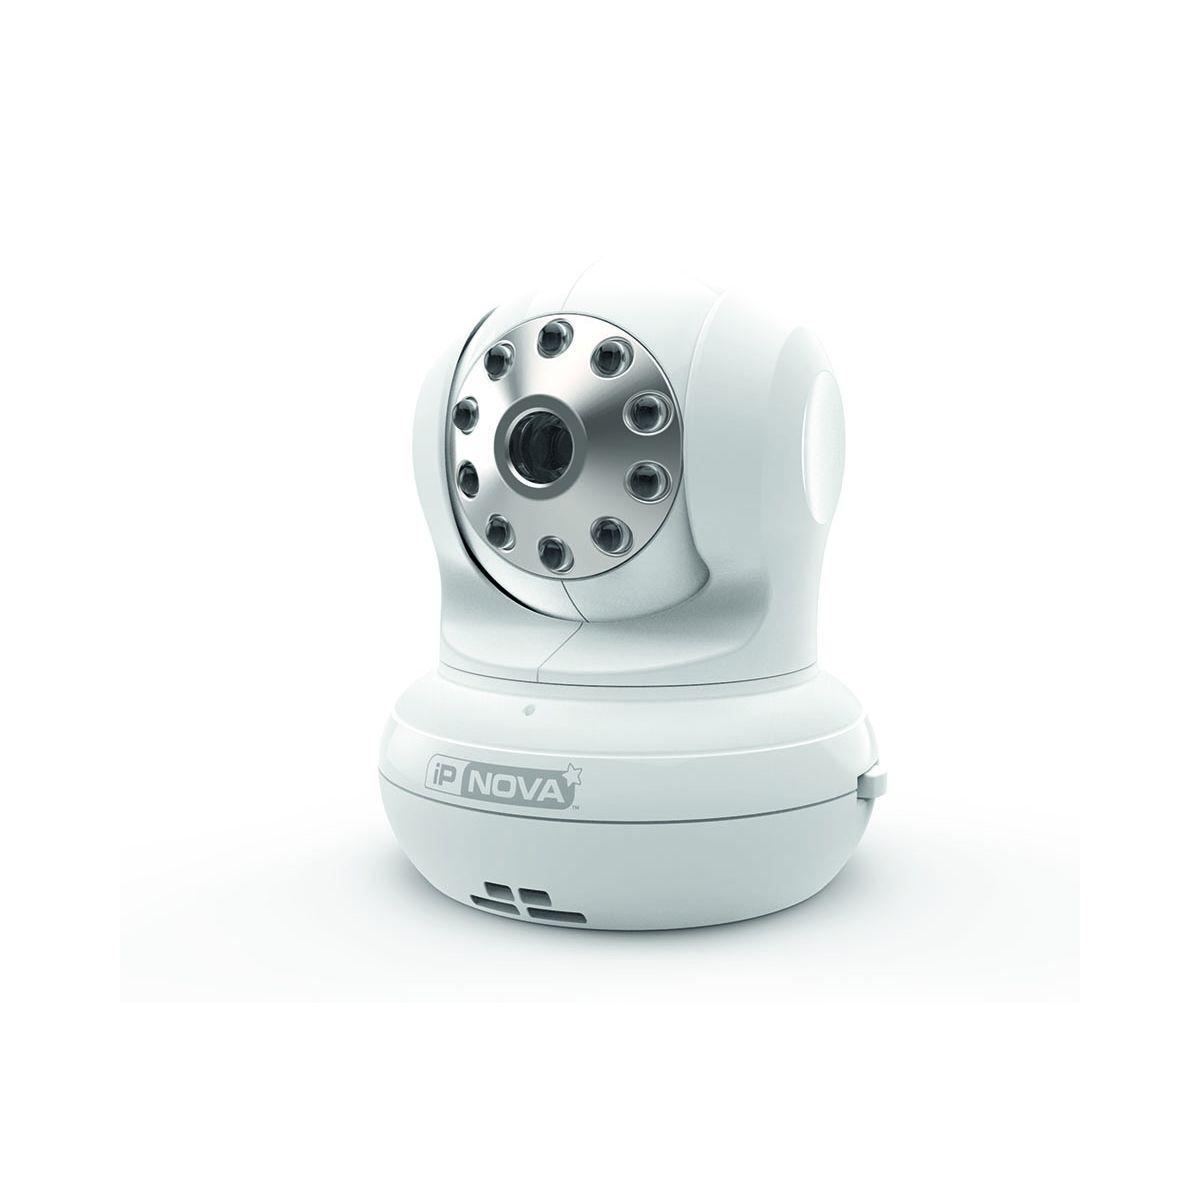 ipnova-camera-babyphone